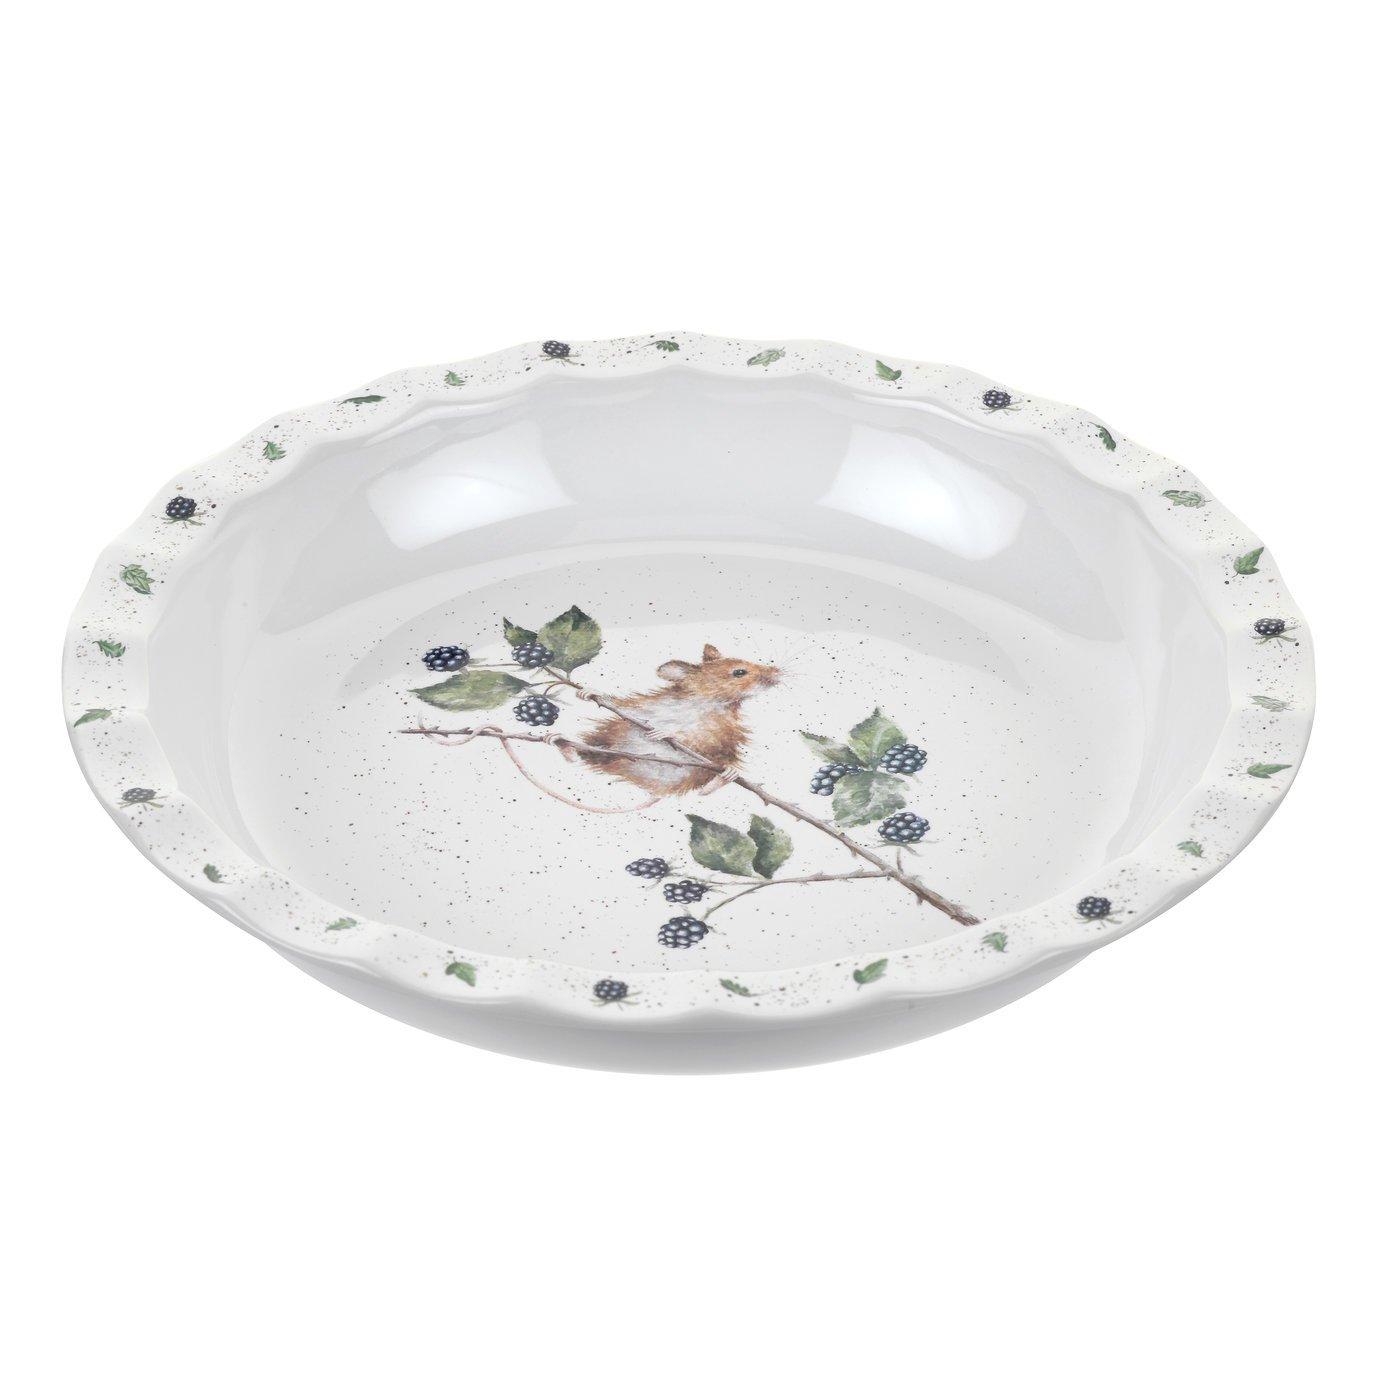 Wrendale Pie Dish (Mouse), Bone China, Multi Coloured, 27.5 x 27.5 x 4.5 cm Royal Worcester WN4028-XL